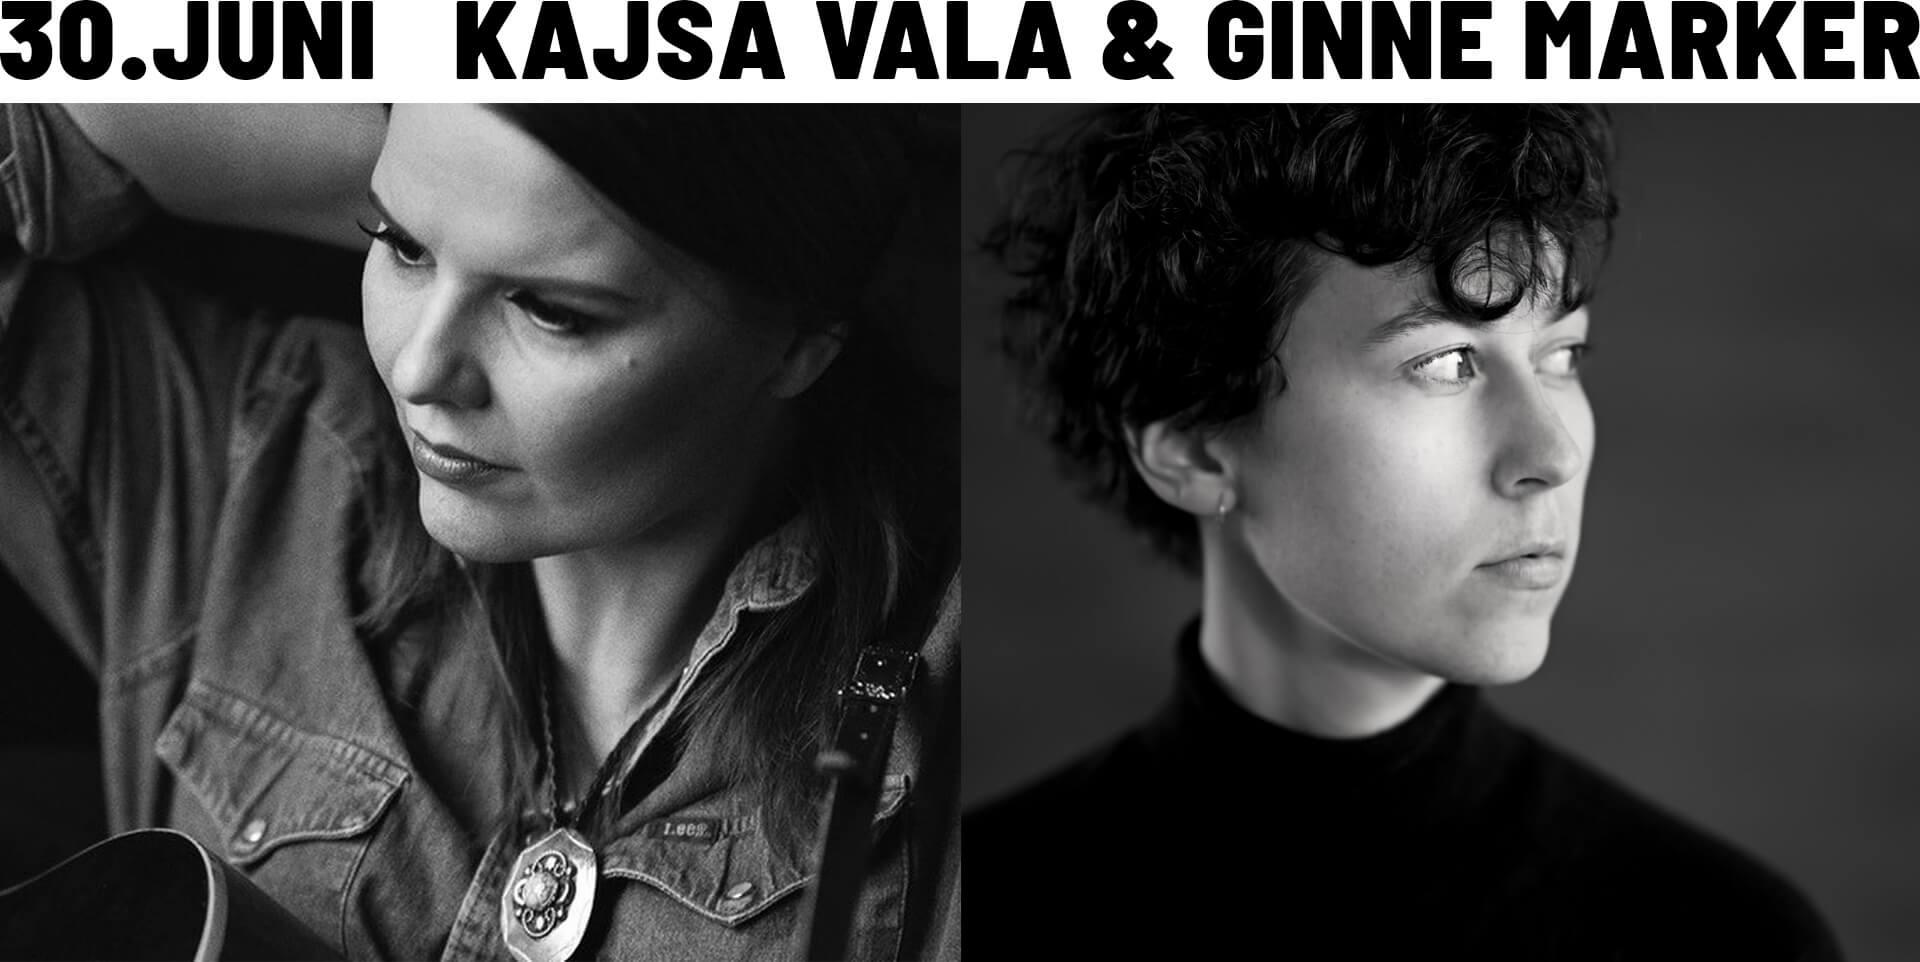 Kajsa Vala & Ginne Marker -  Cinema Concert - 30. juni